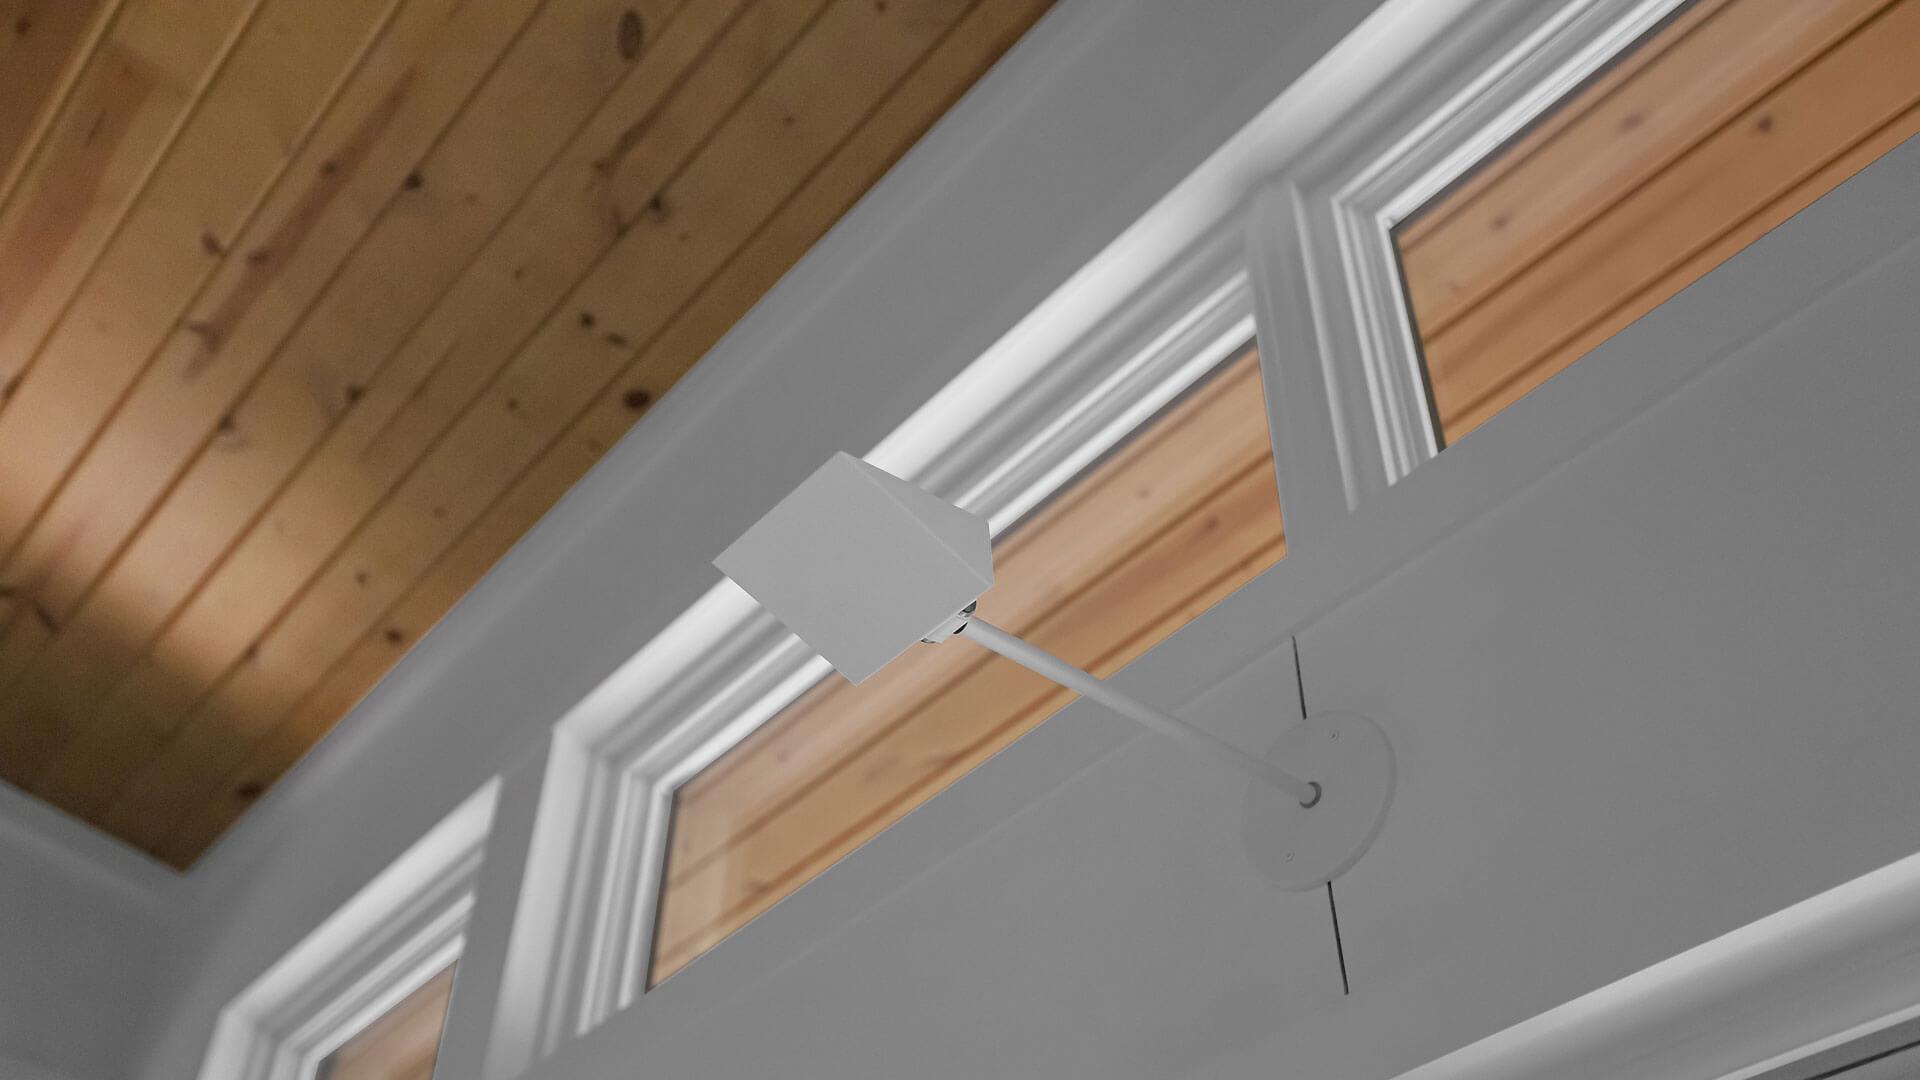 Uplights highlight wood ceilings in vaulted living room - Bridge House - Fennville, Michigan - Lake Michigan